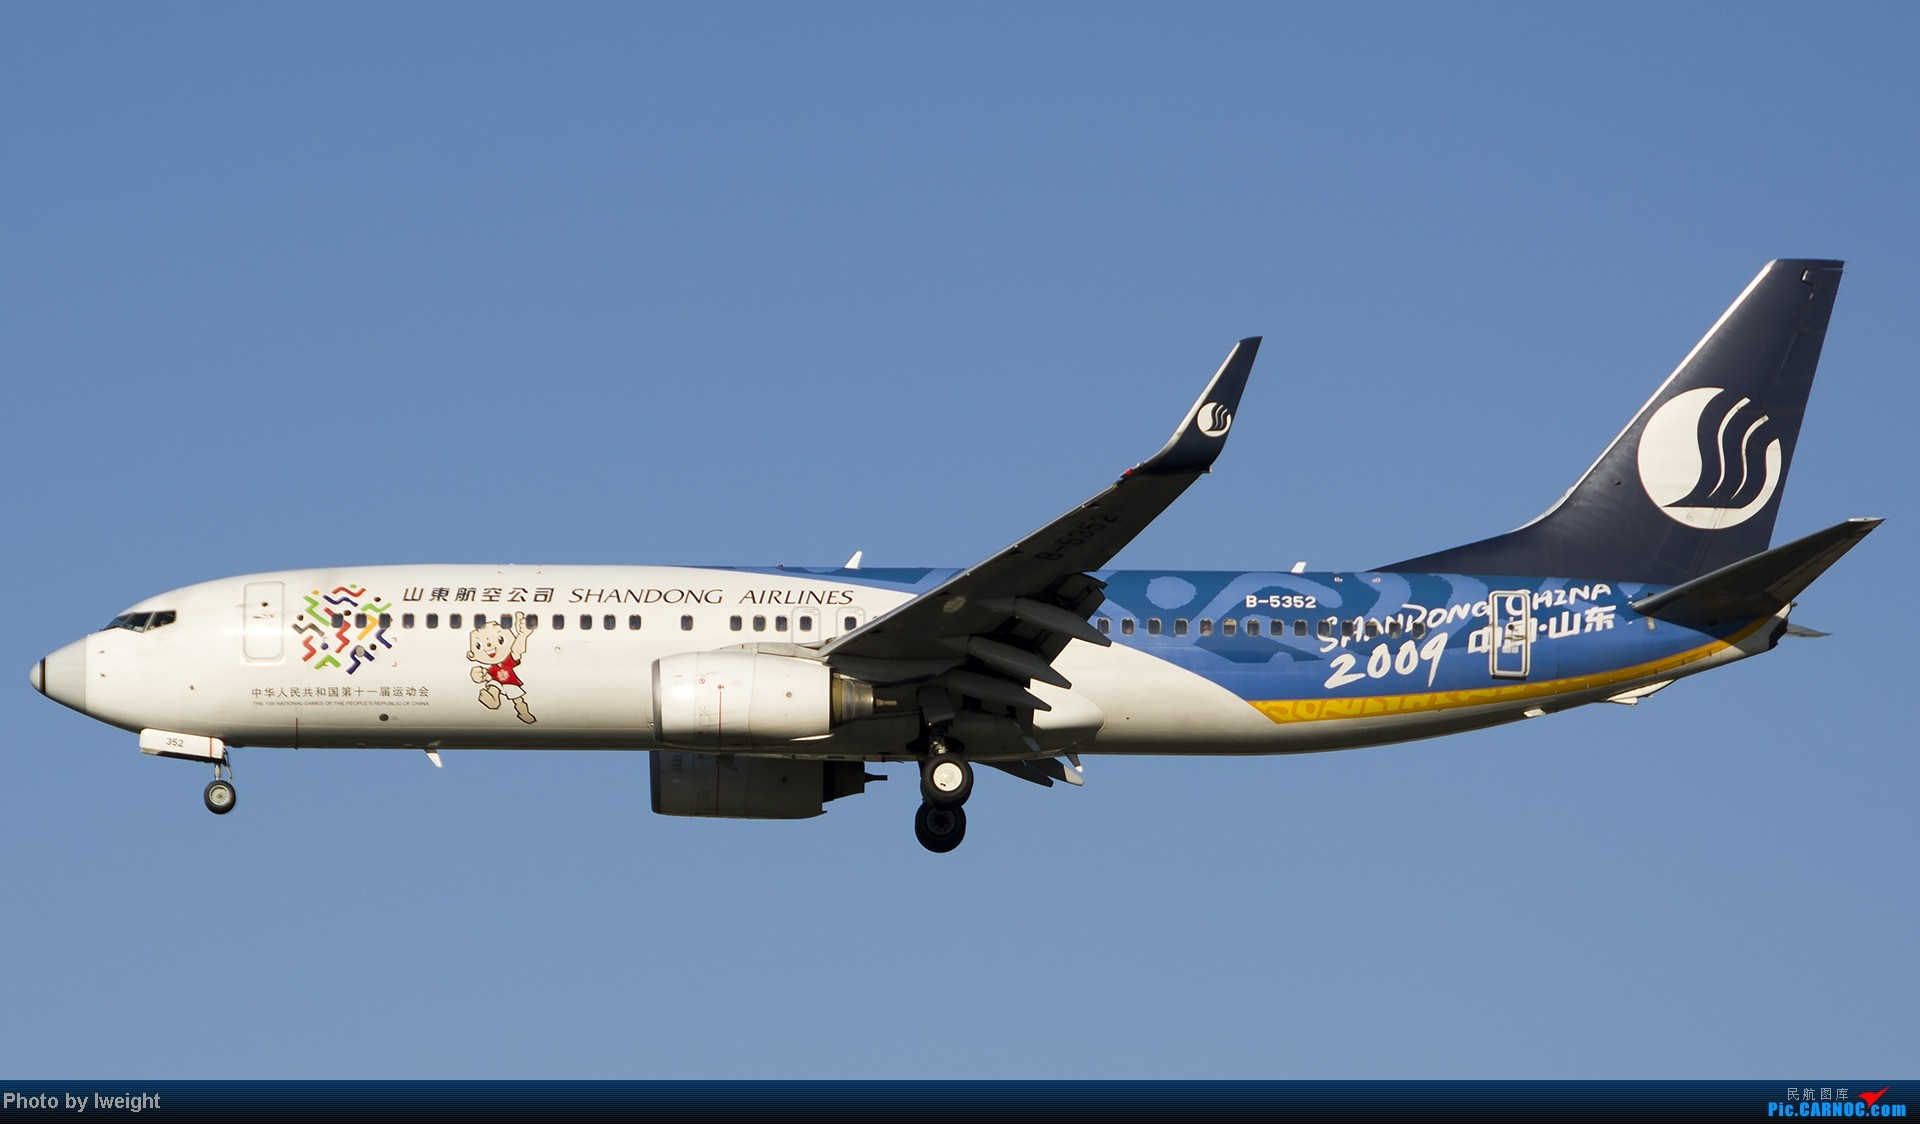 Re:[原创]新相机+好天气,PEK试机乱拍 BOEING 737-800 B-5352 中国北京首都机场